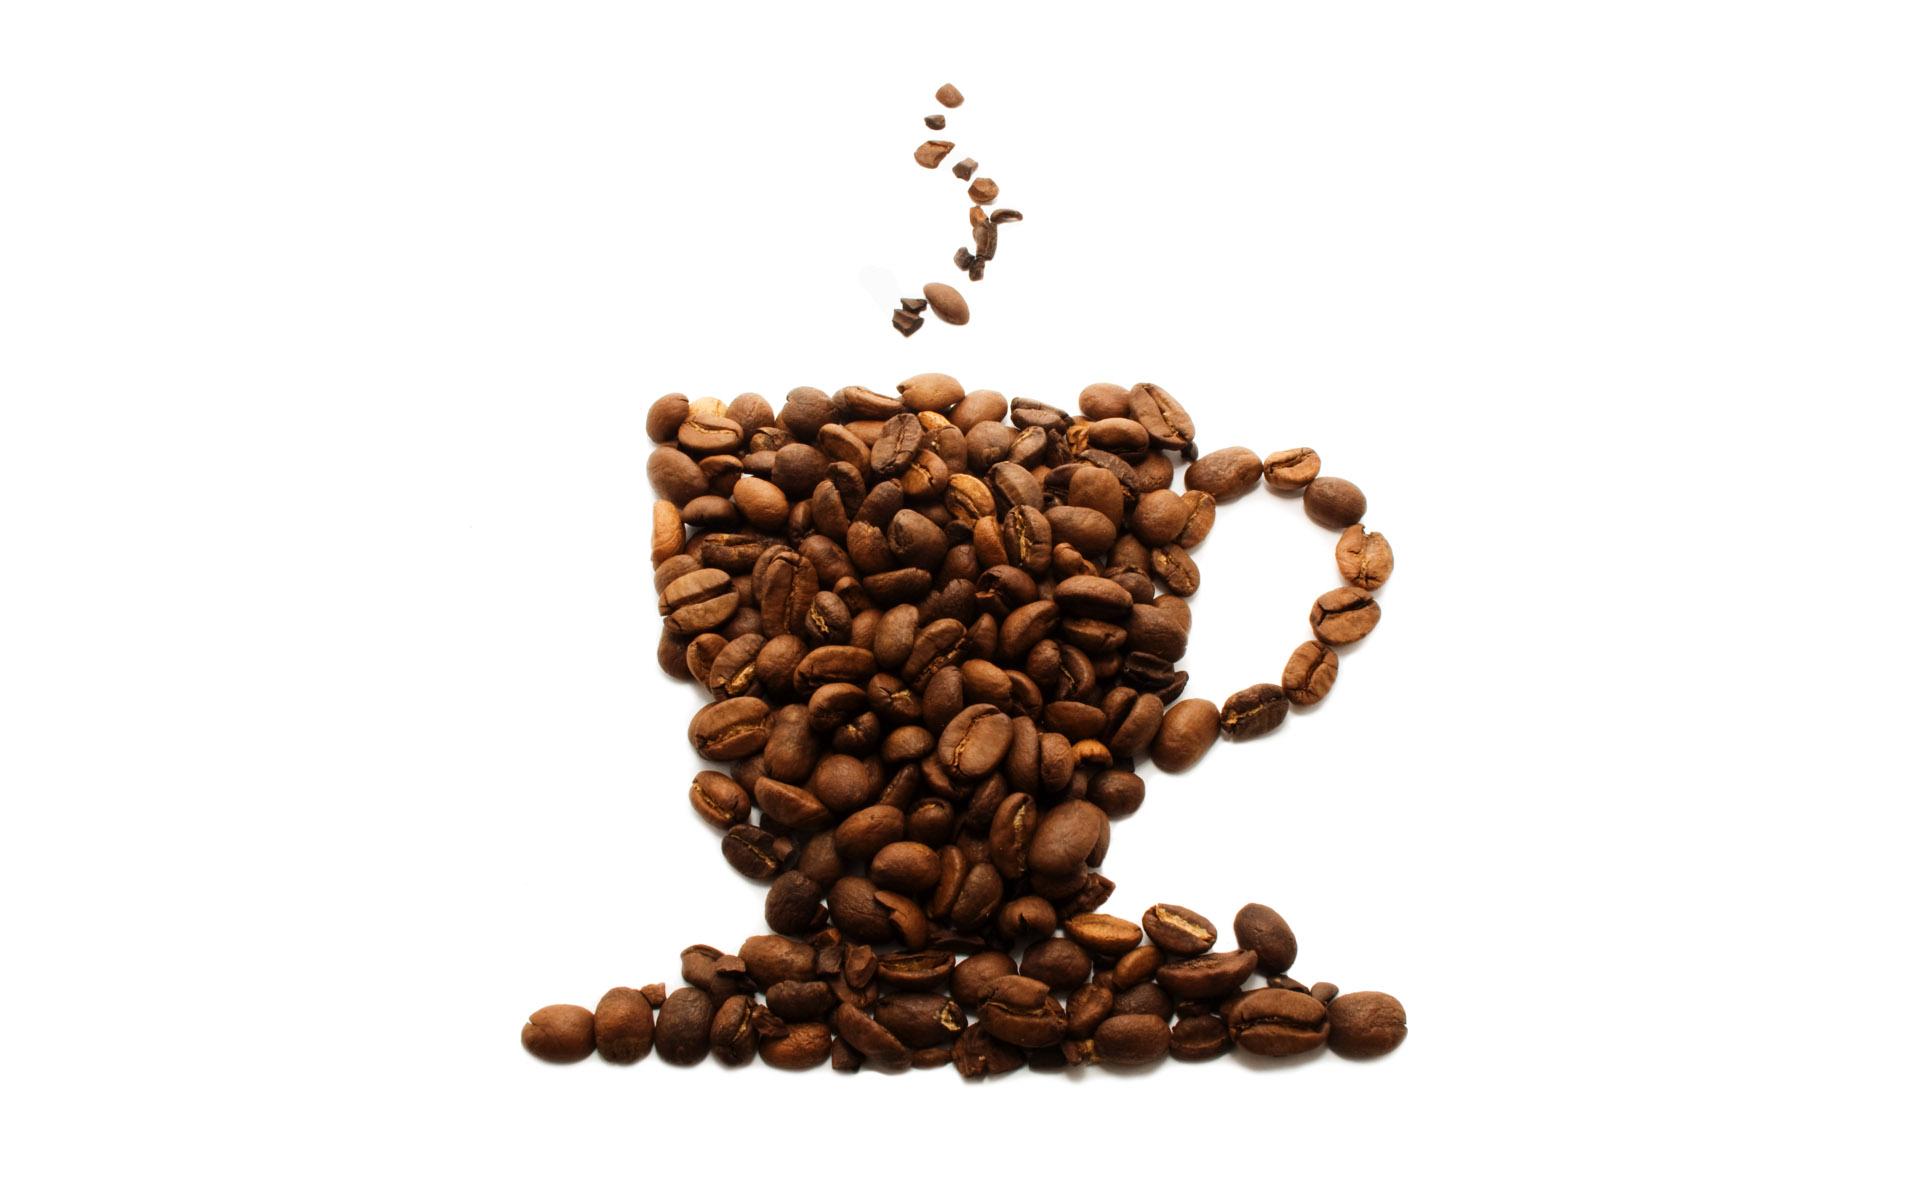 Kaffee und tee wallpapers